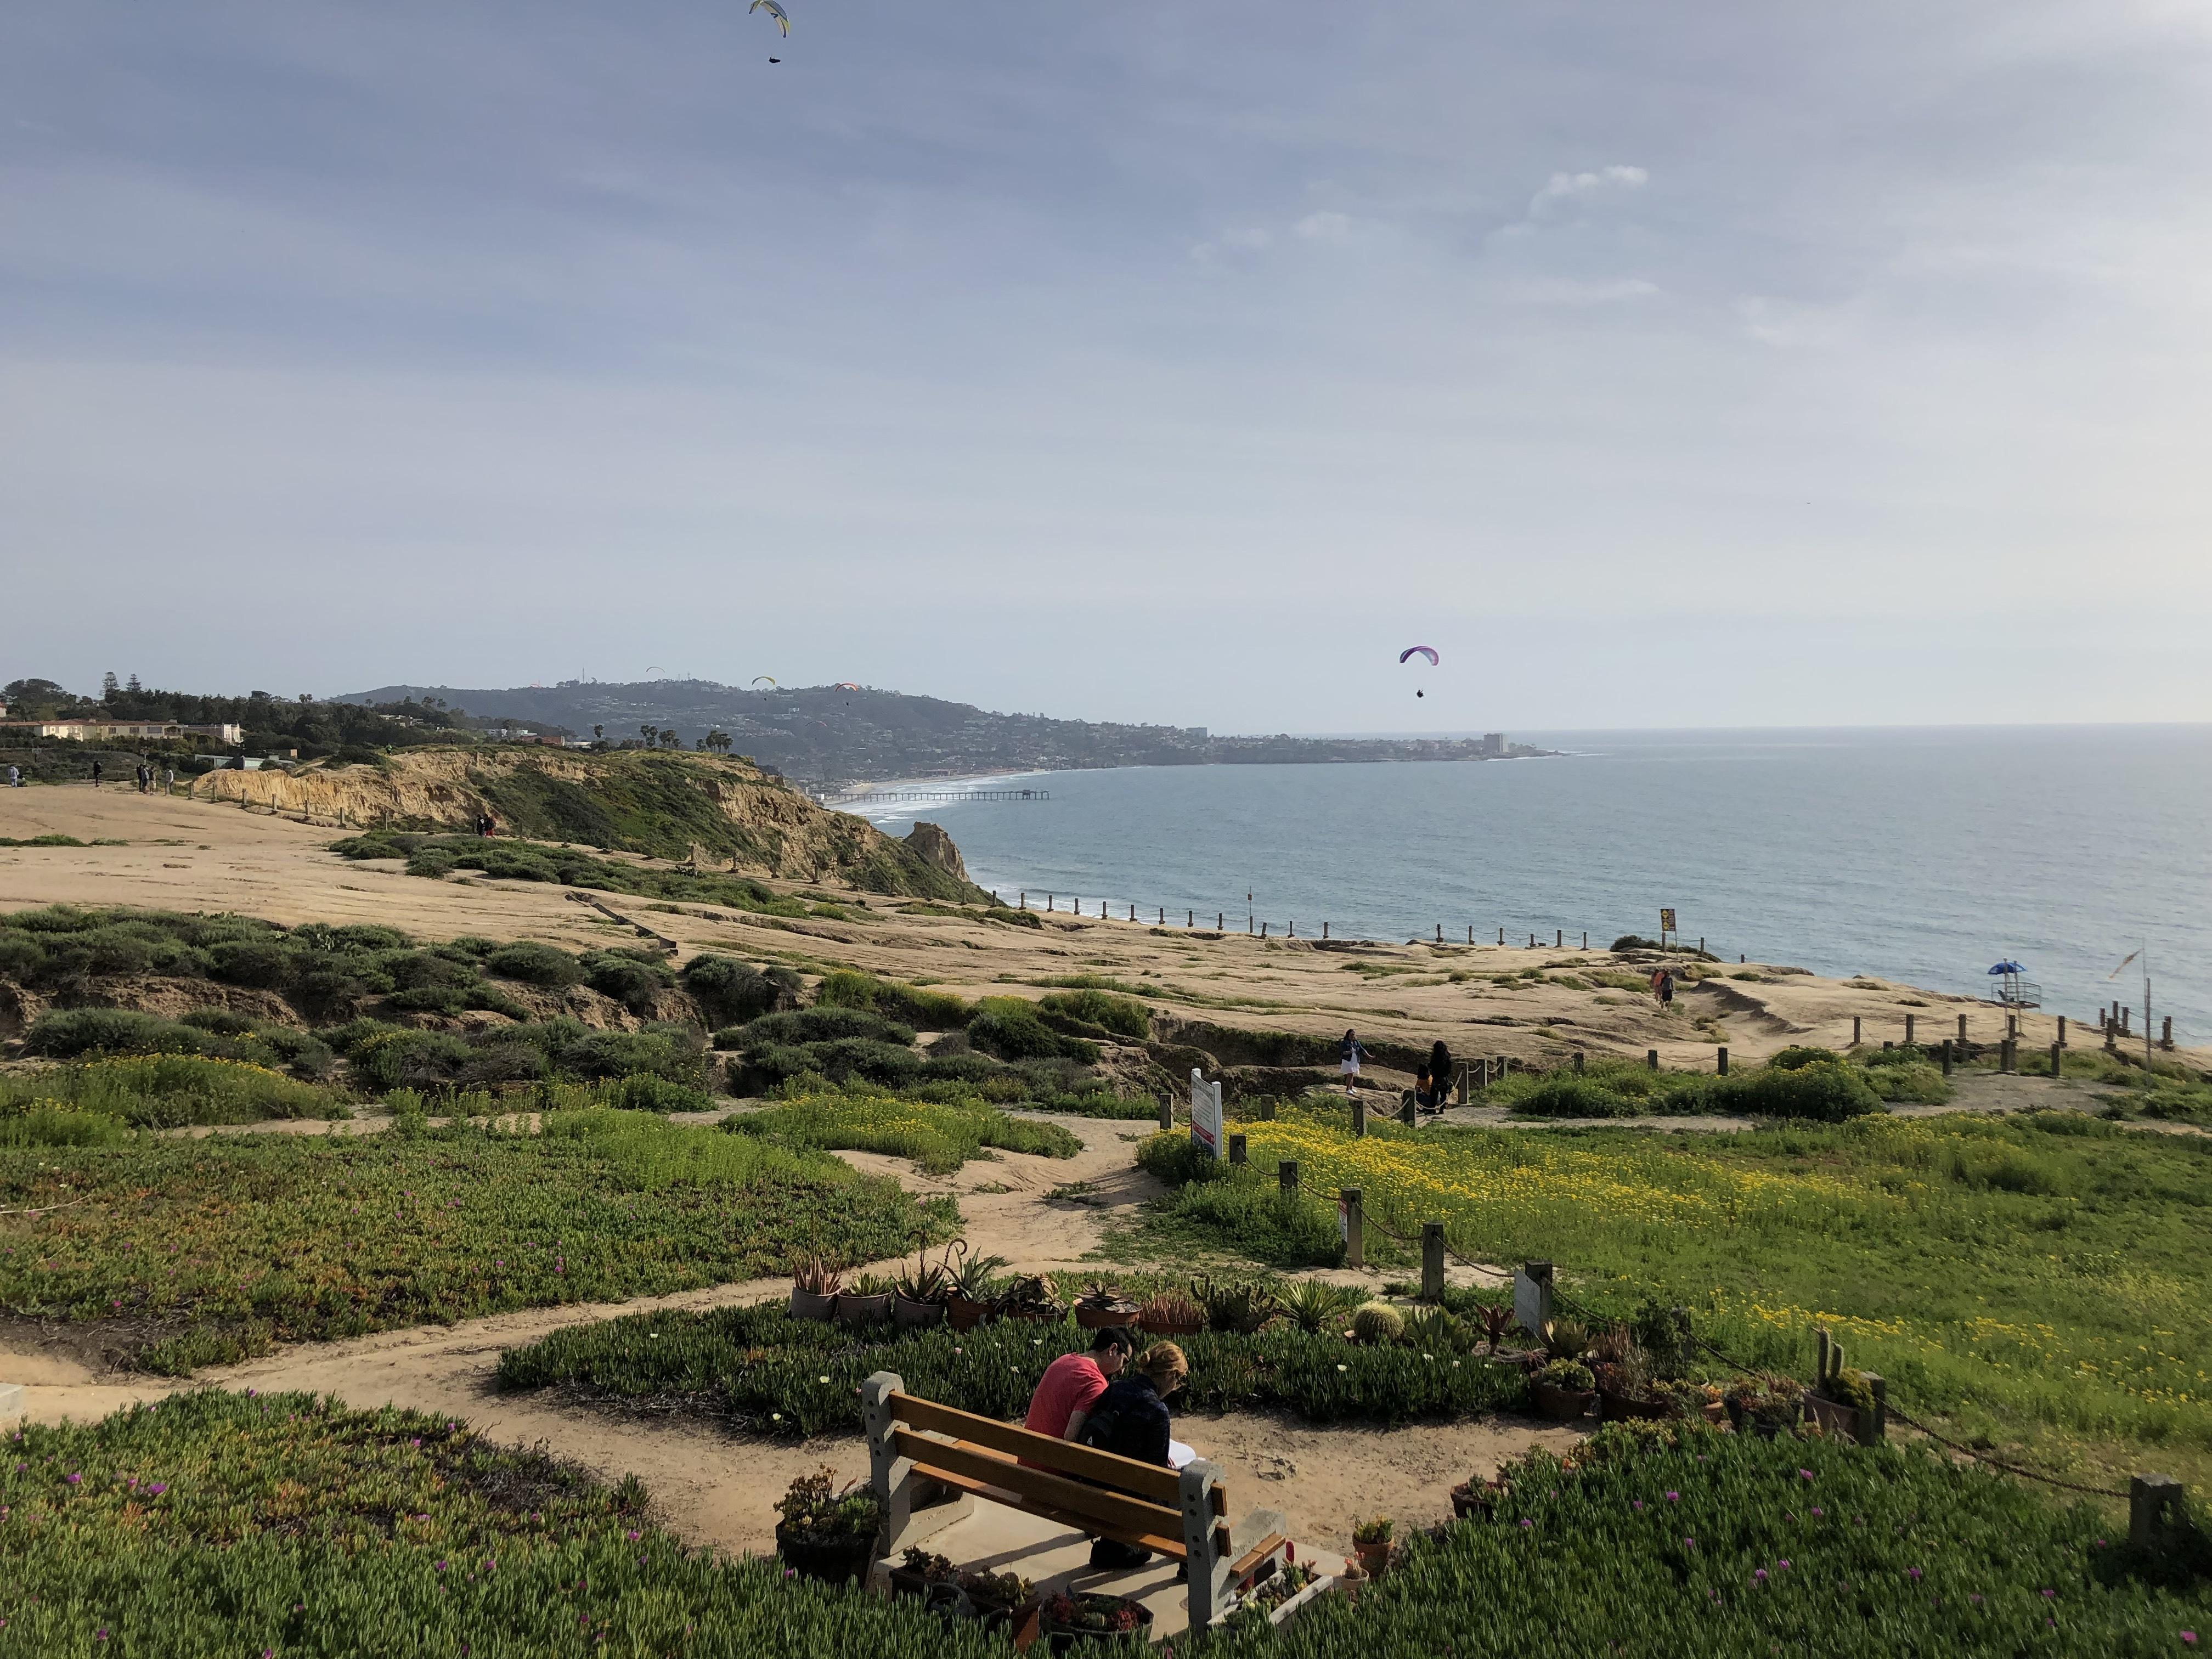 San-Diego-La-Jolla-park.jpeg?mtime=20190509091343#asset:105742